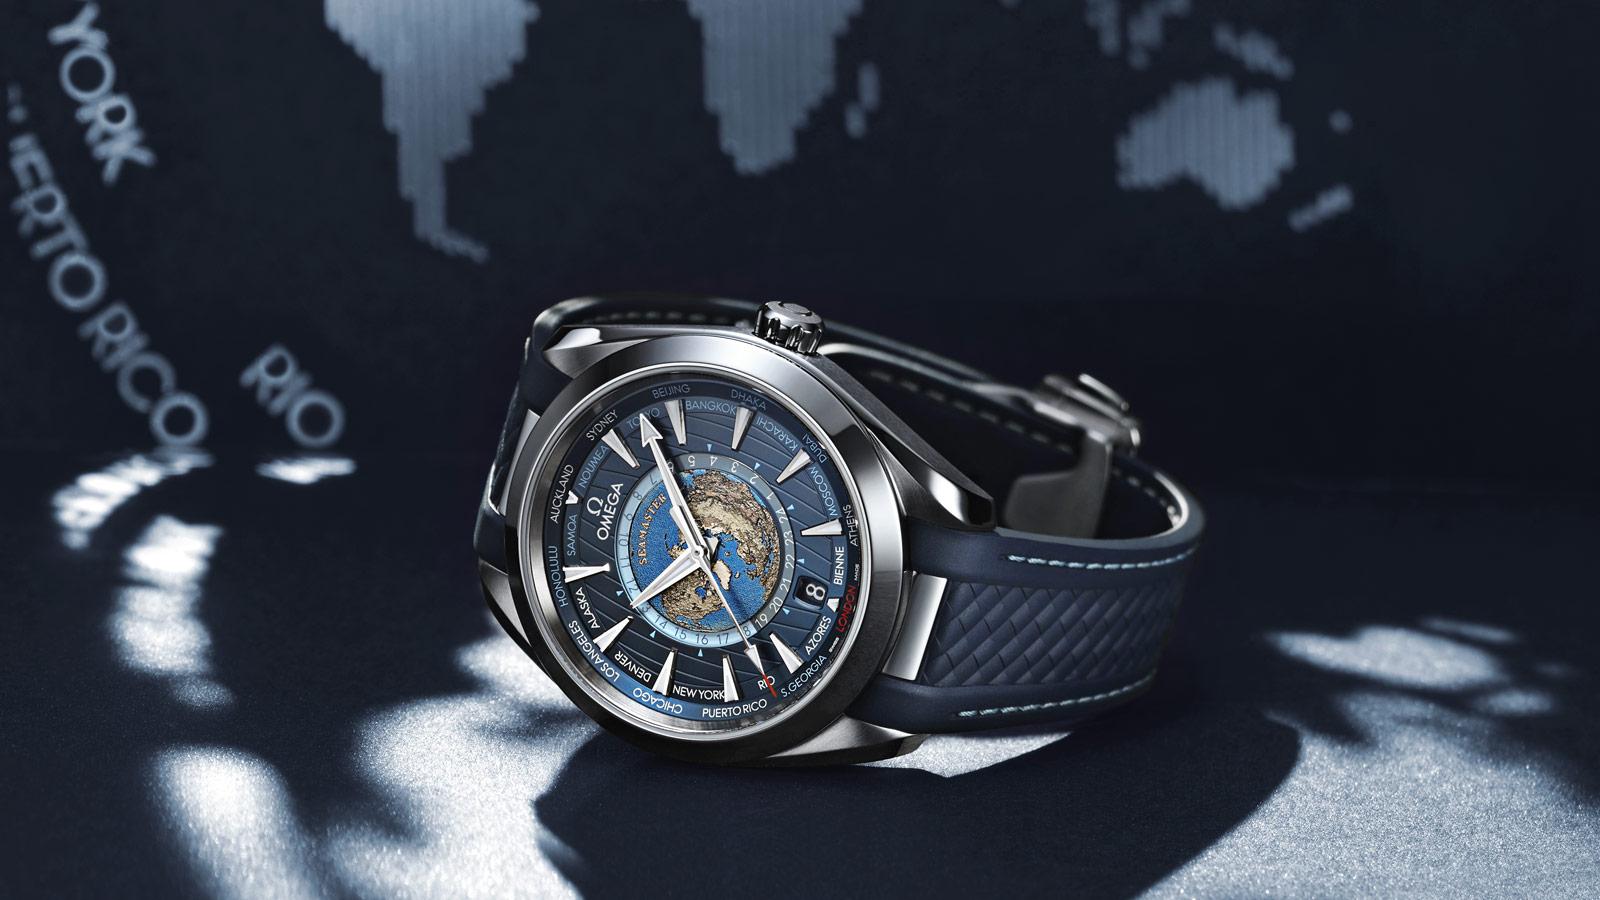 Seamaster 海马系列Aqua Terra 150米腕表 Aqua Terra 150米腕表 欧米茄同轴至臻天文台GMT世界时腕表43毫米 腕表 - 220.12.43.22.03.001